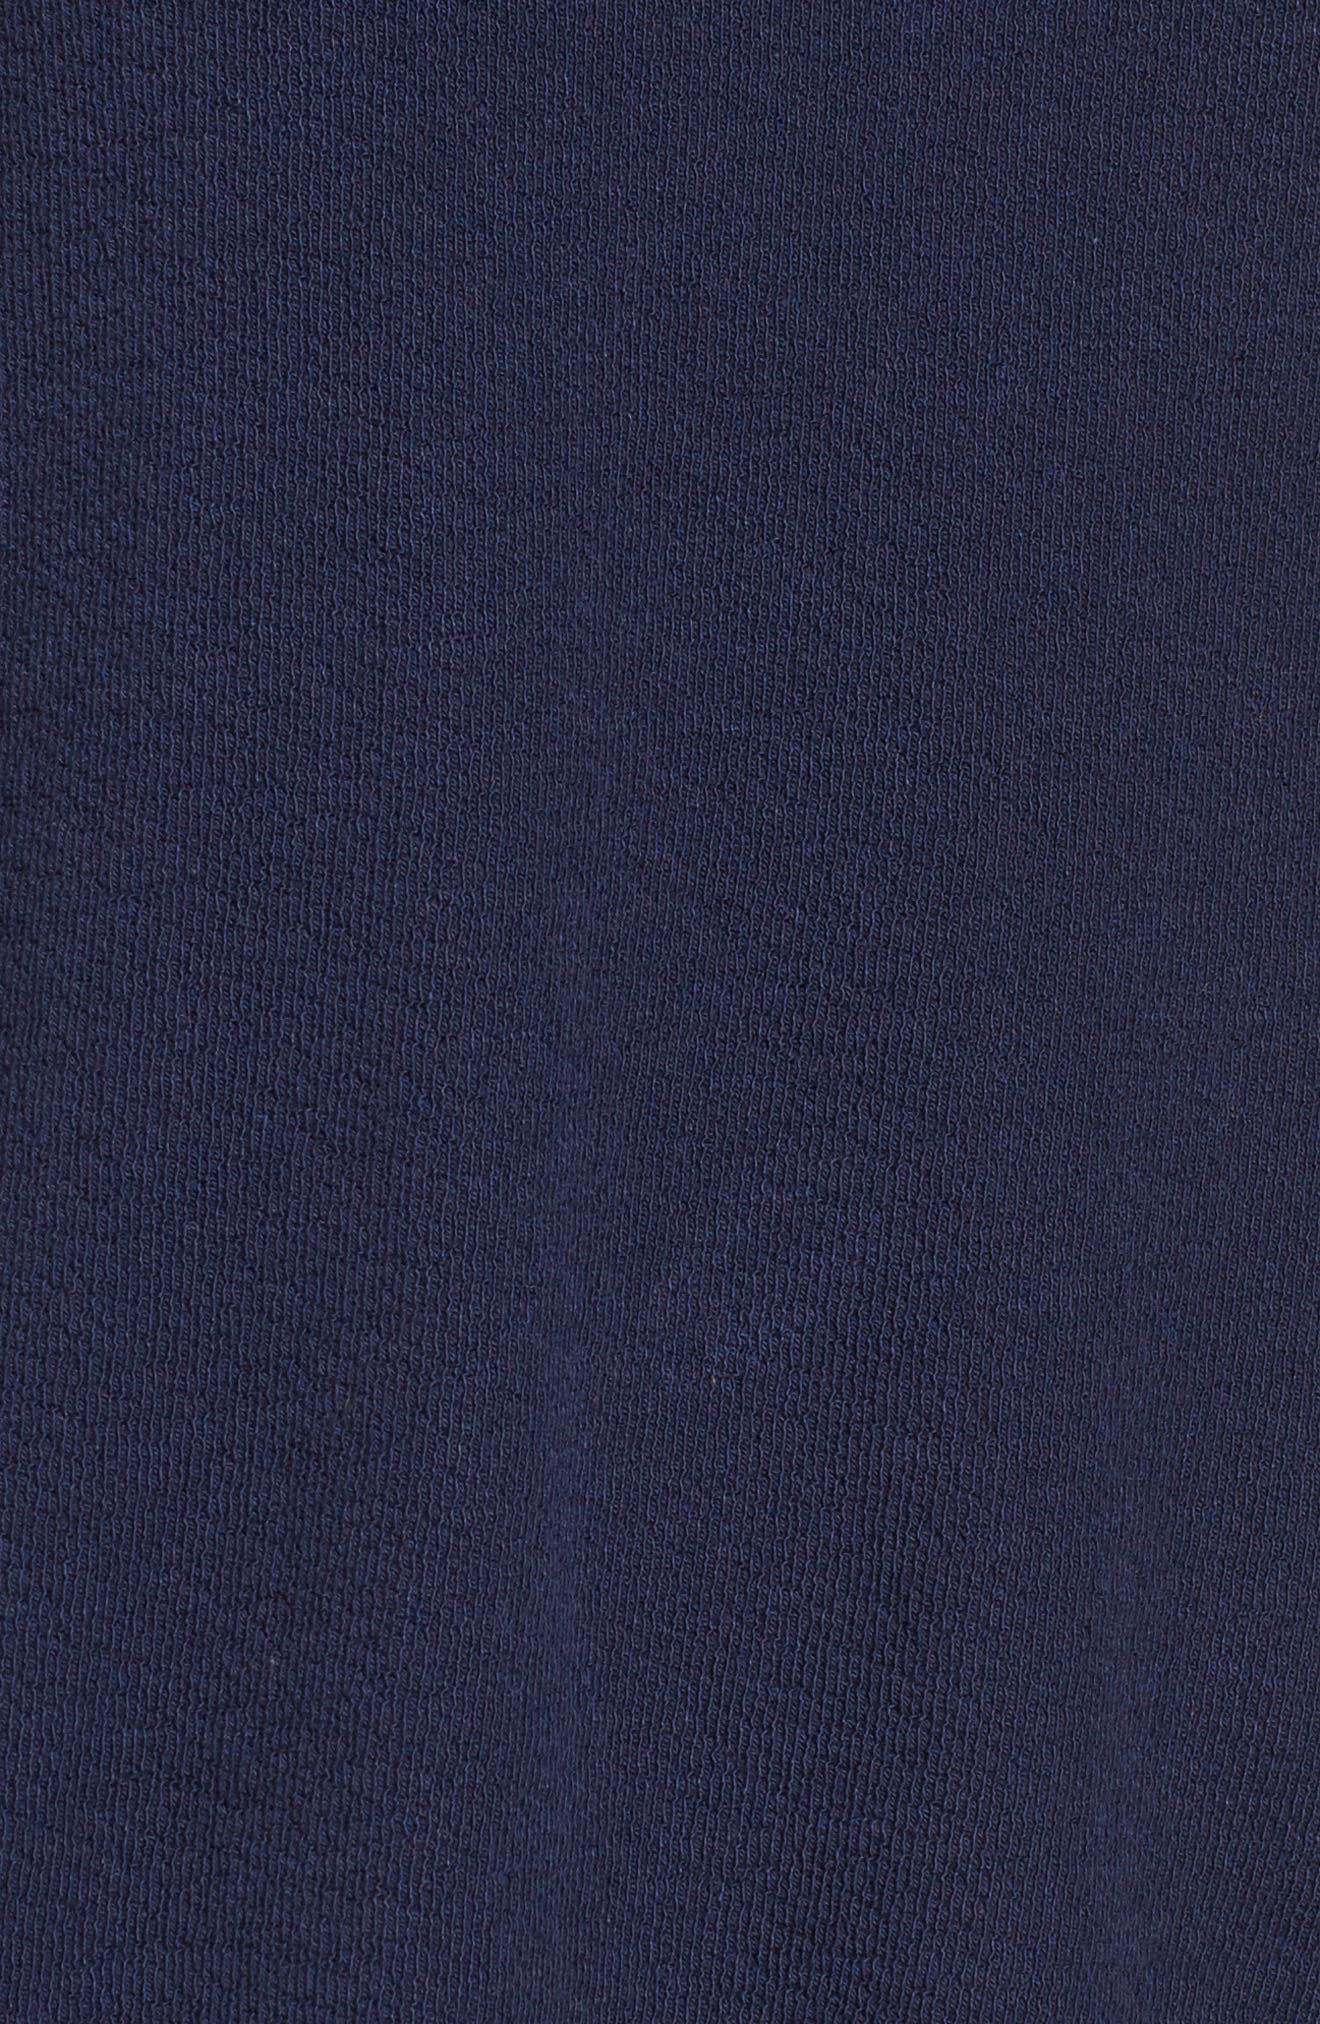 Crochet Lace Trim Sweatshirt,                             Alternate thumbnail 5, color,                             Navy Peacoat